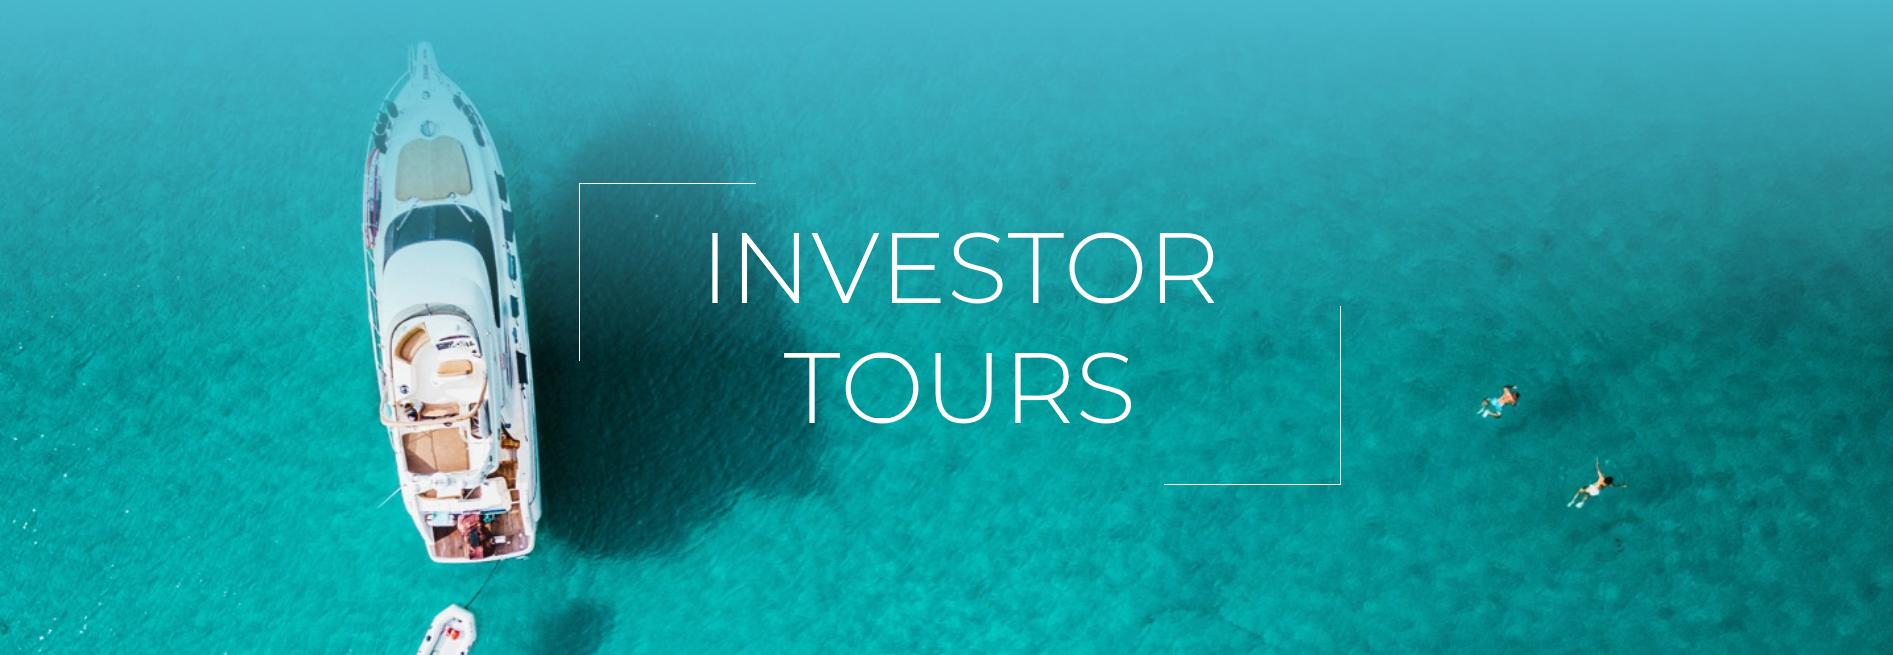 Investor Tours